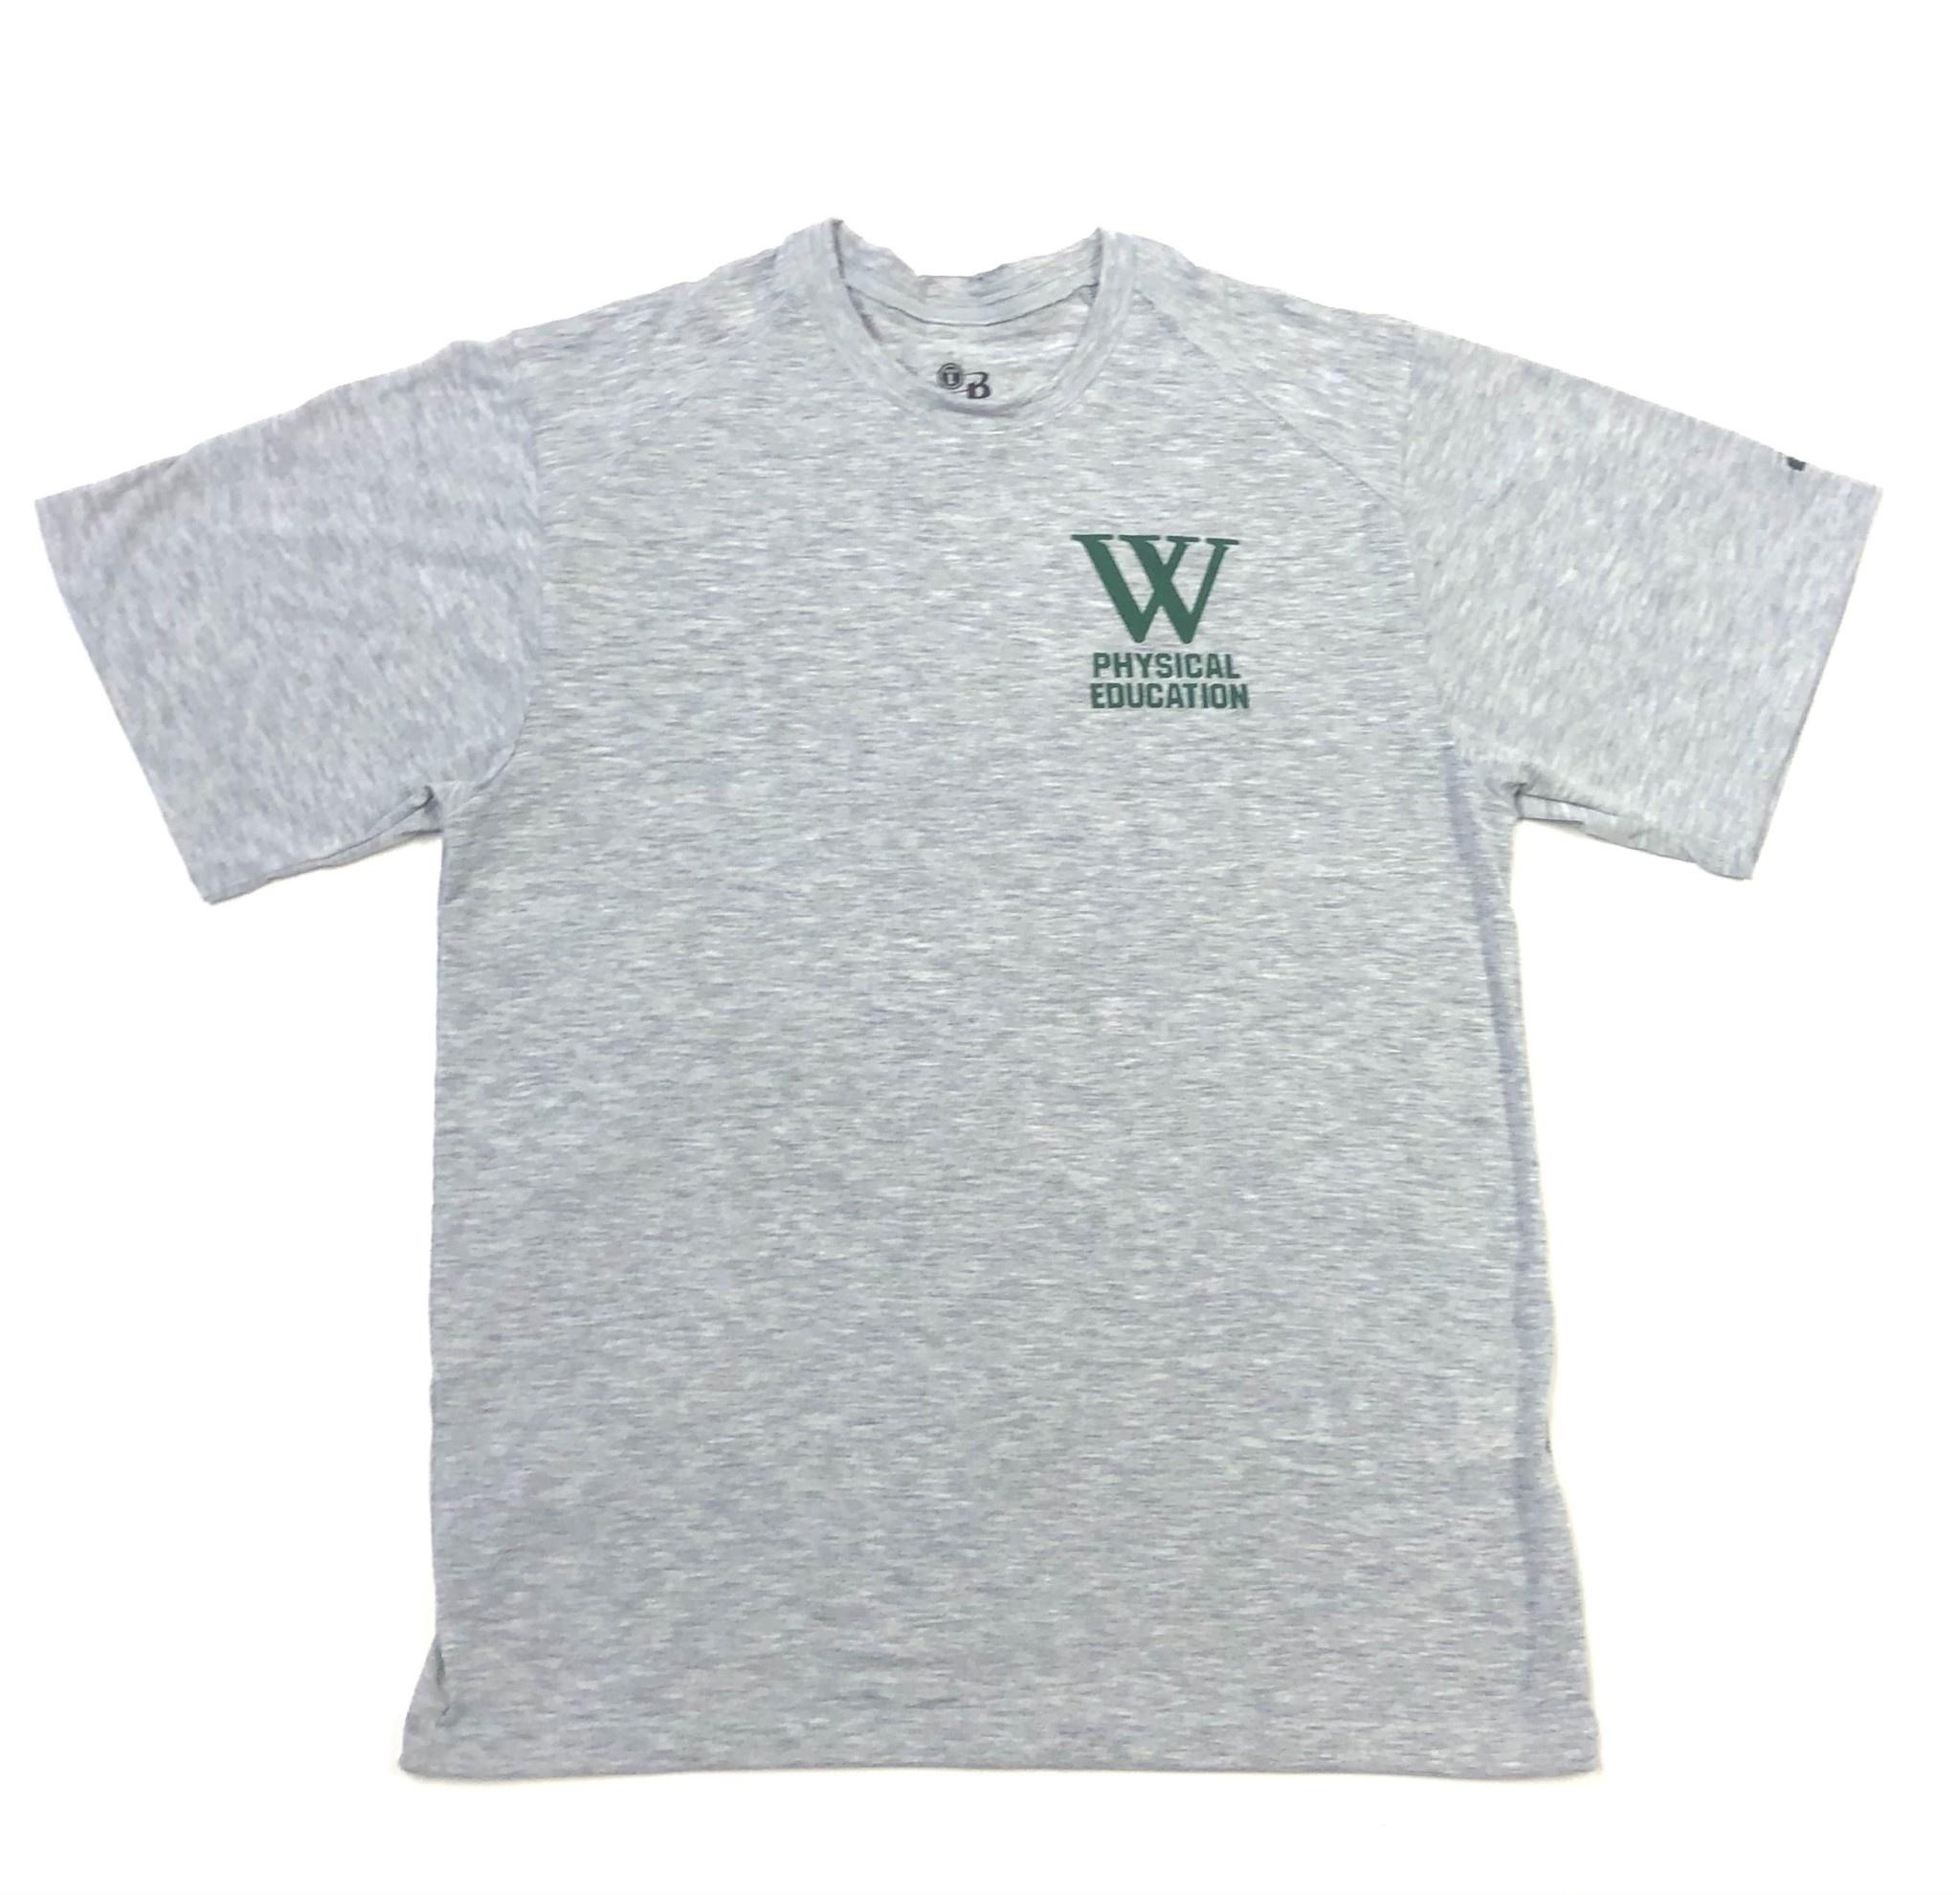 Middle School PE Shirt